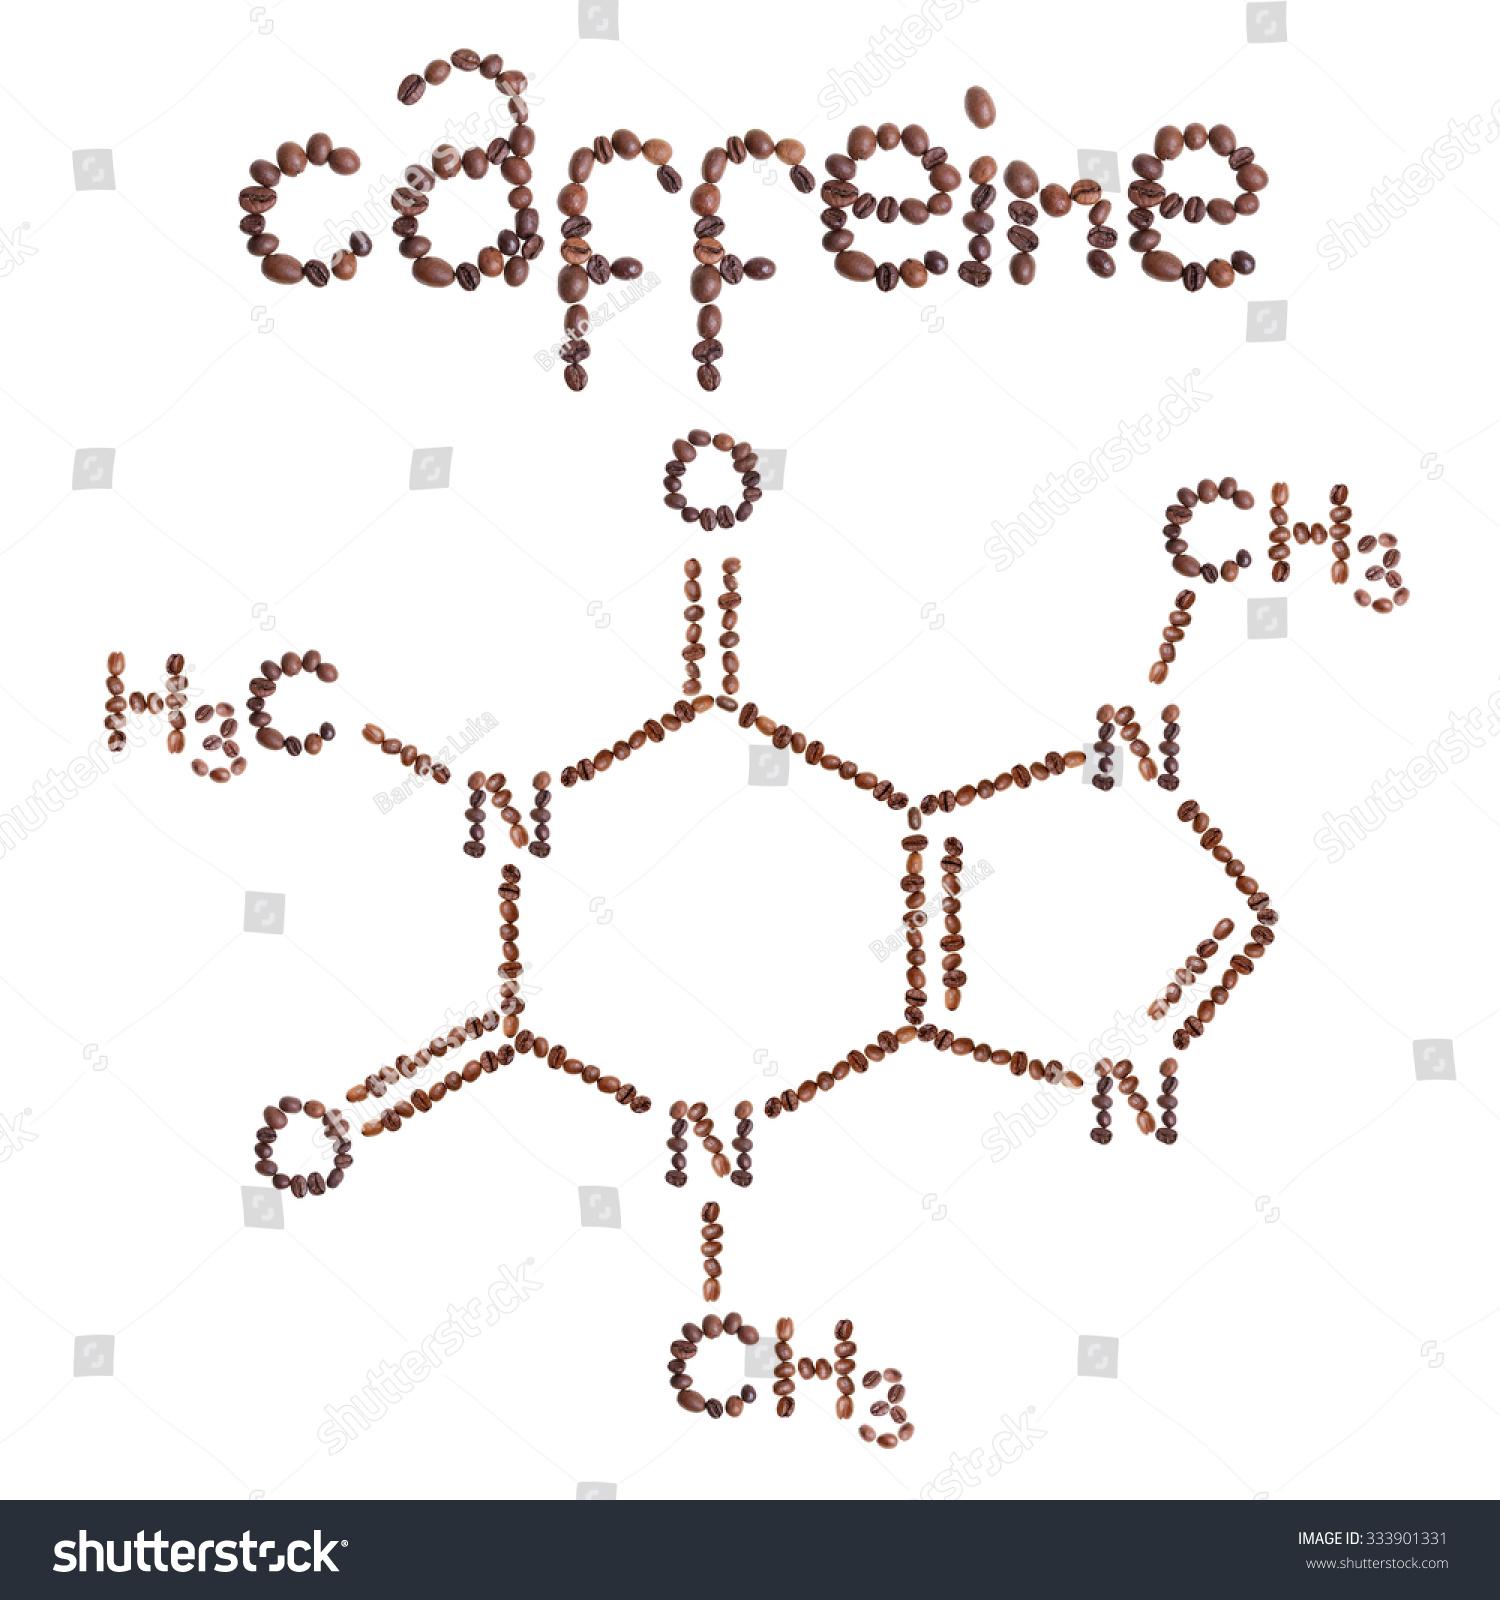 caffeine molecule diagram caffeine database wiring diagram caffeine chemical molecule structure structural formula stock